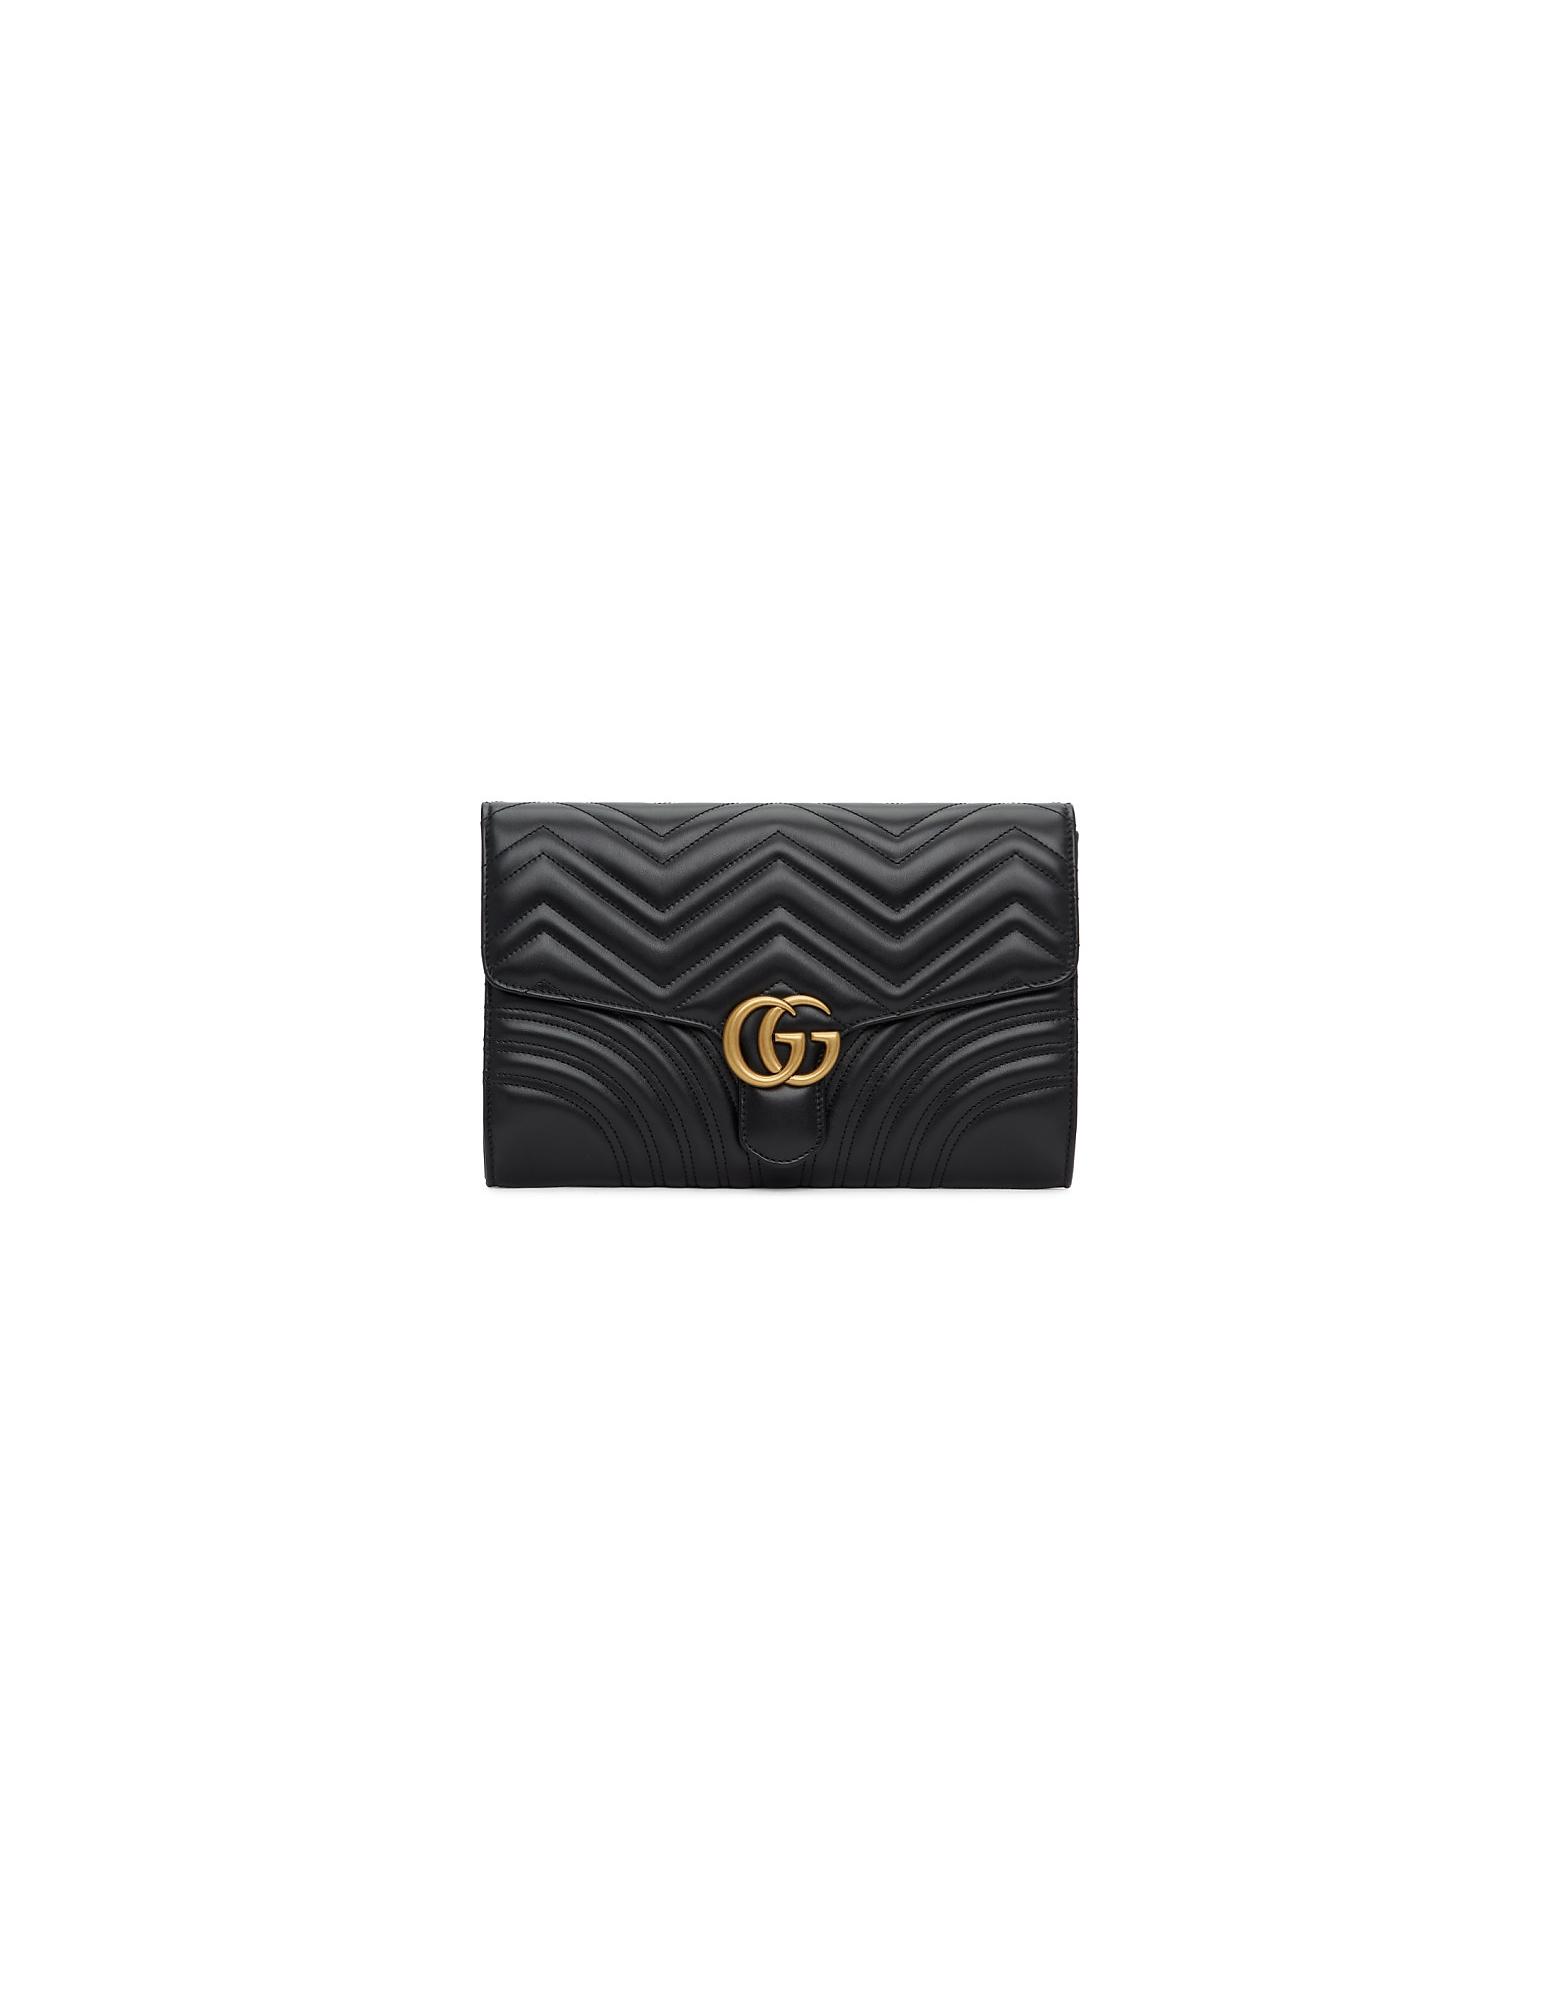 Gucci Designer Handbags, Black Medium GG Marmont 2.0 Clutch